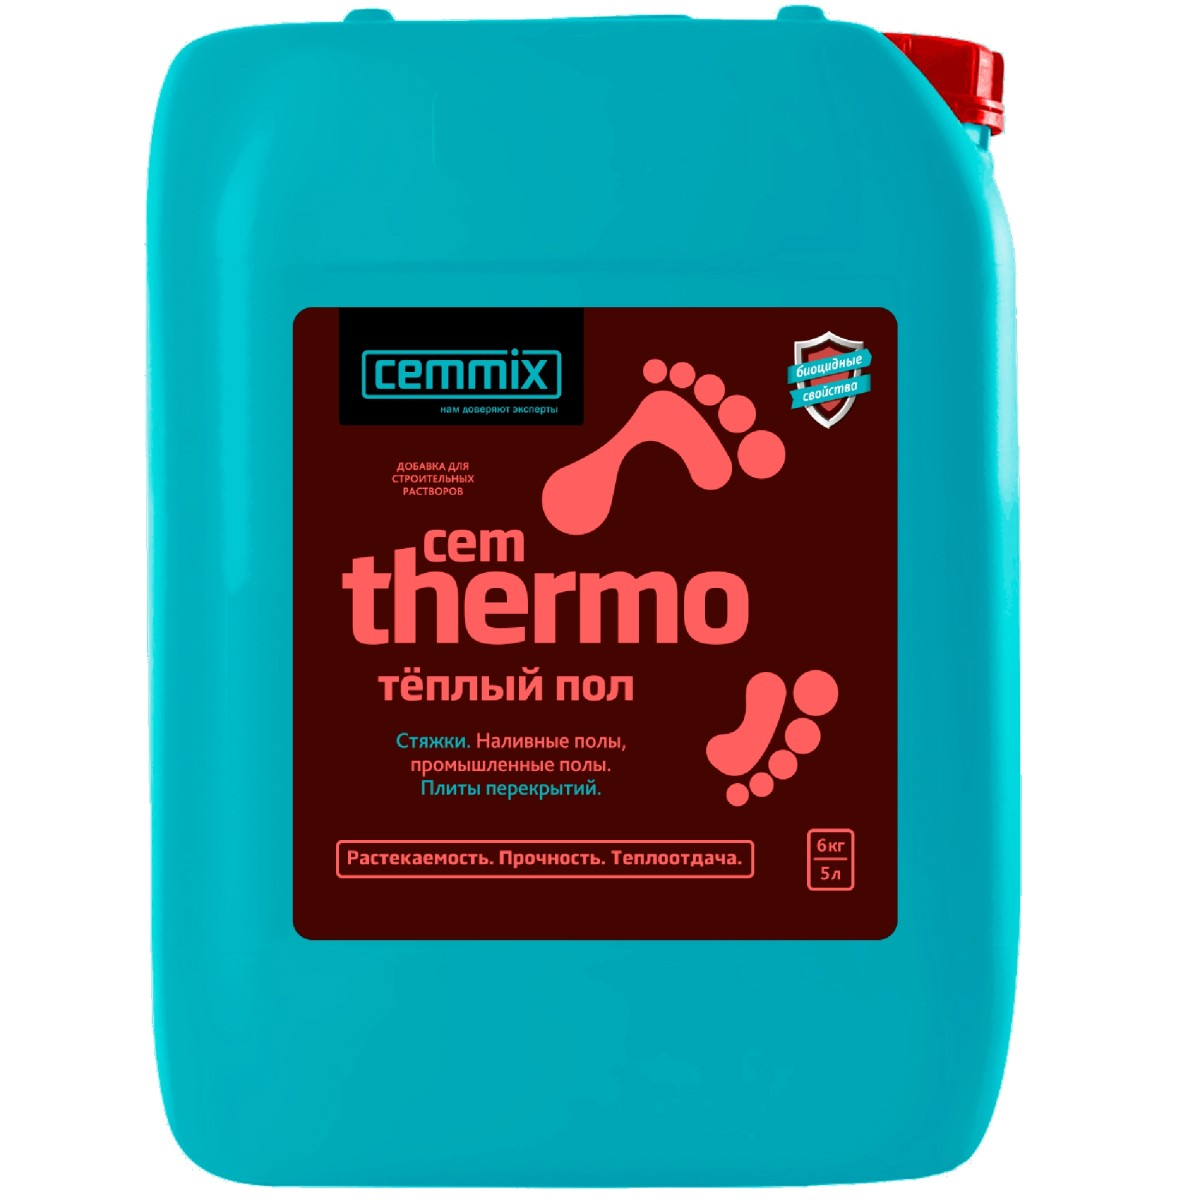 Добавка для теплых полов Cemmix CemThermo